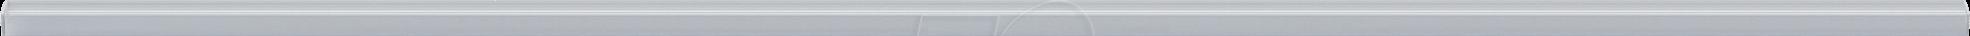 PLM 70809 - Function Square Profil Diffusor 100 cm